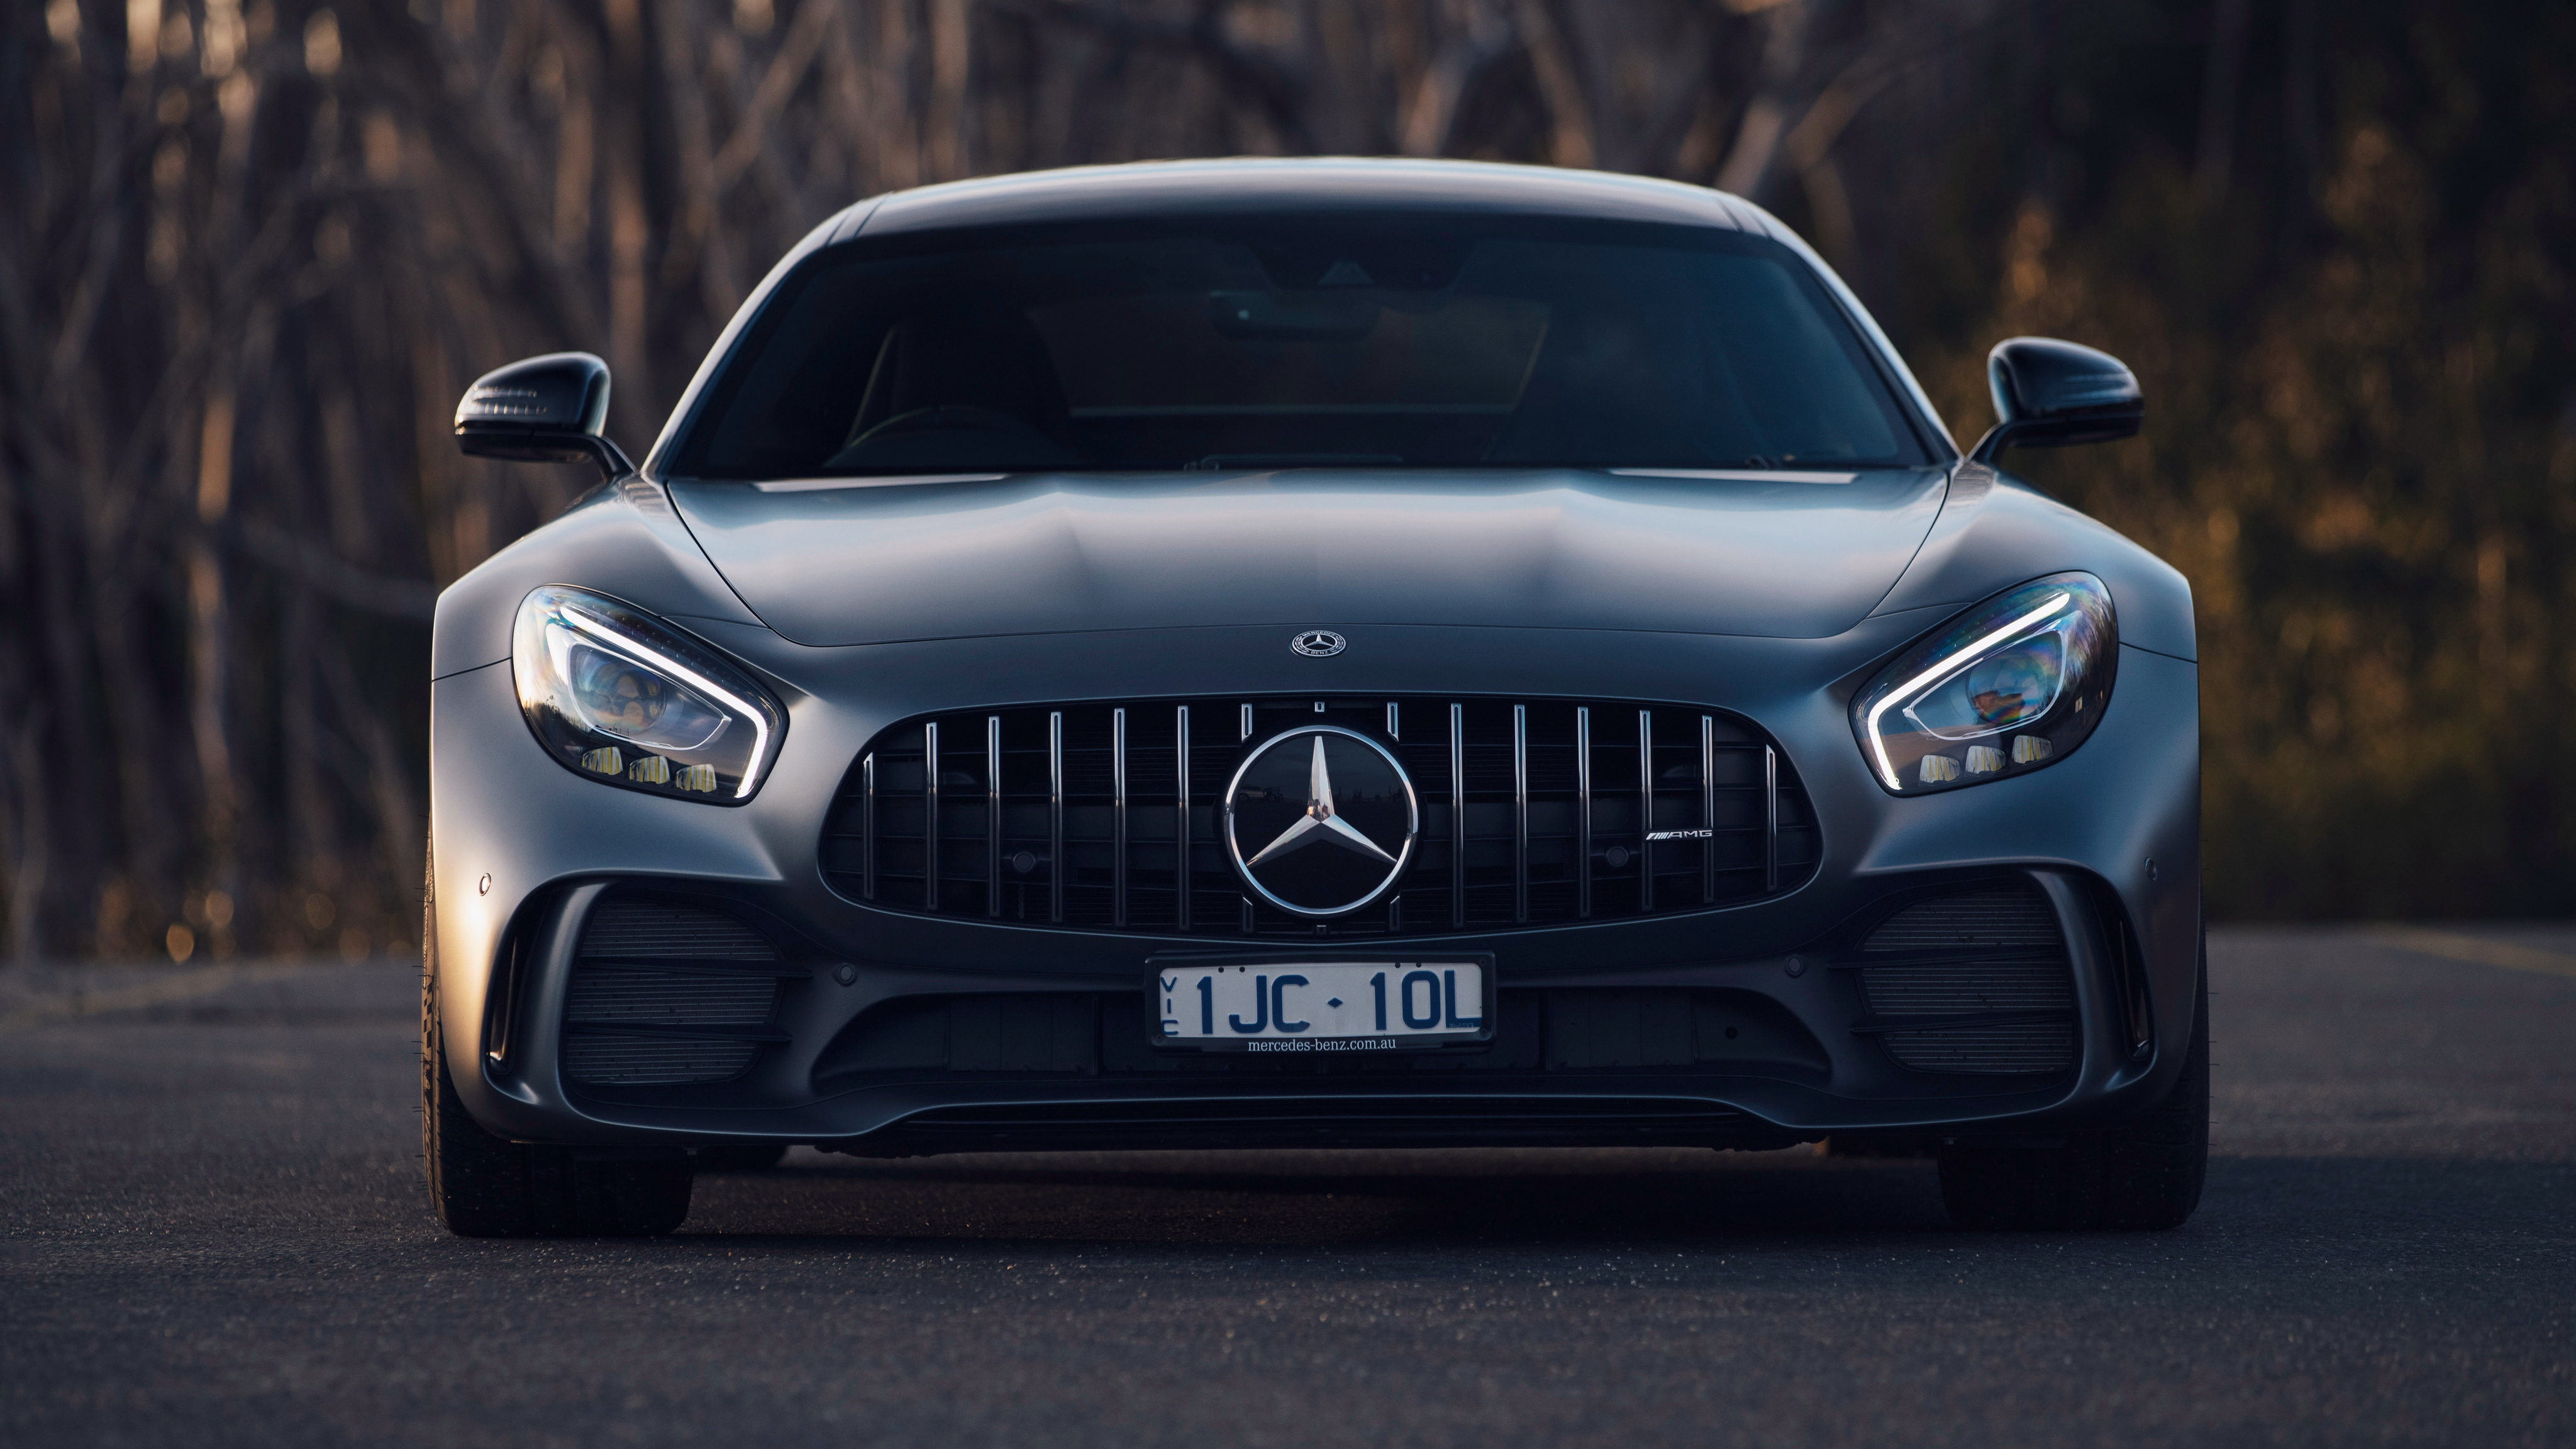 Mercedes Amg Gt R 2018 4k Wallpaper Hd Car Wallpapers Id